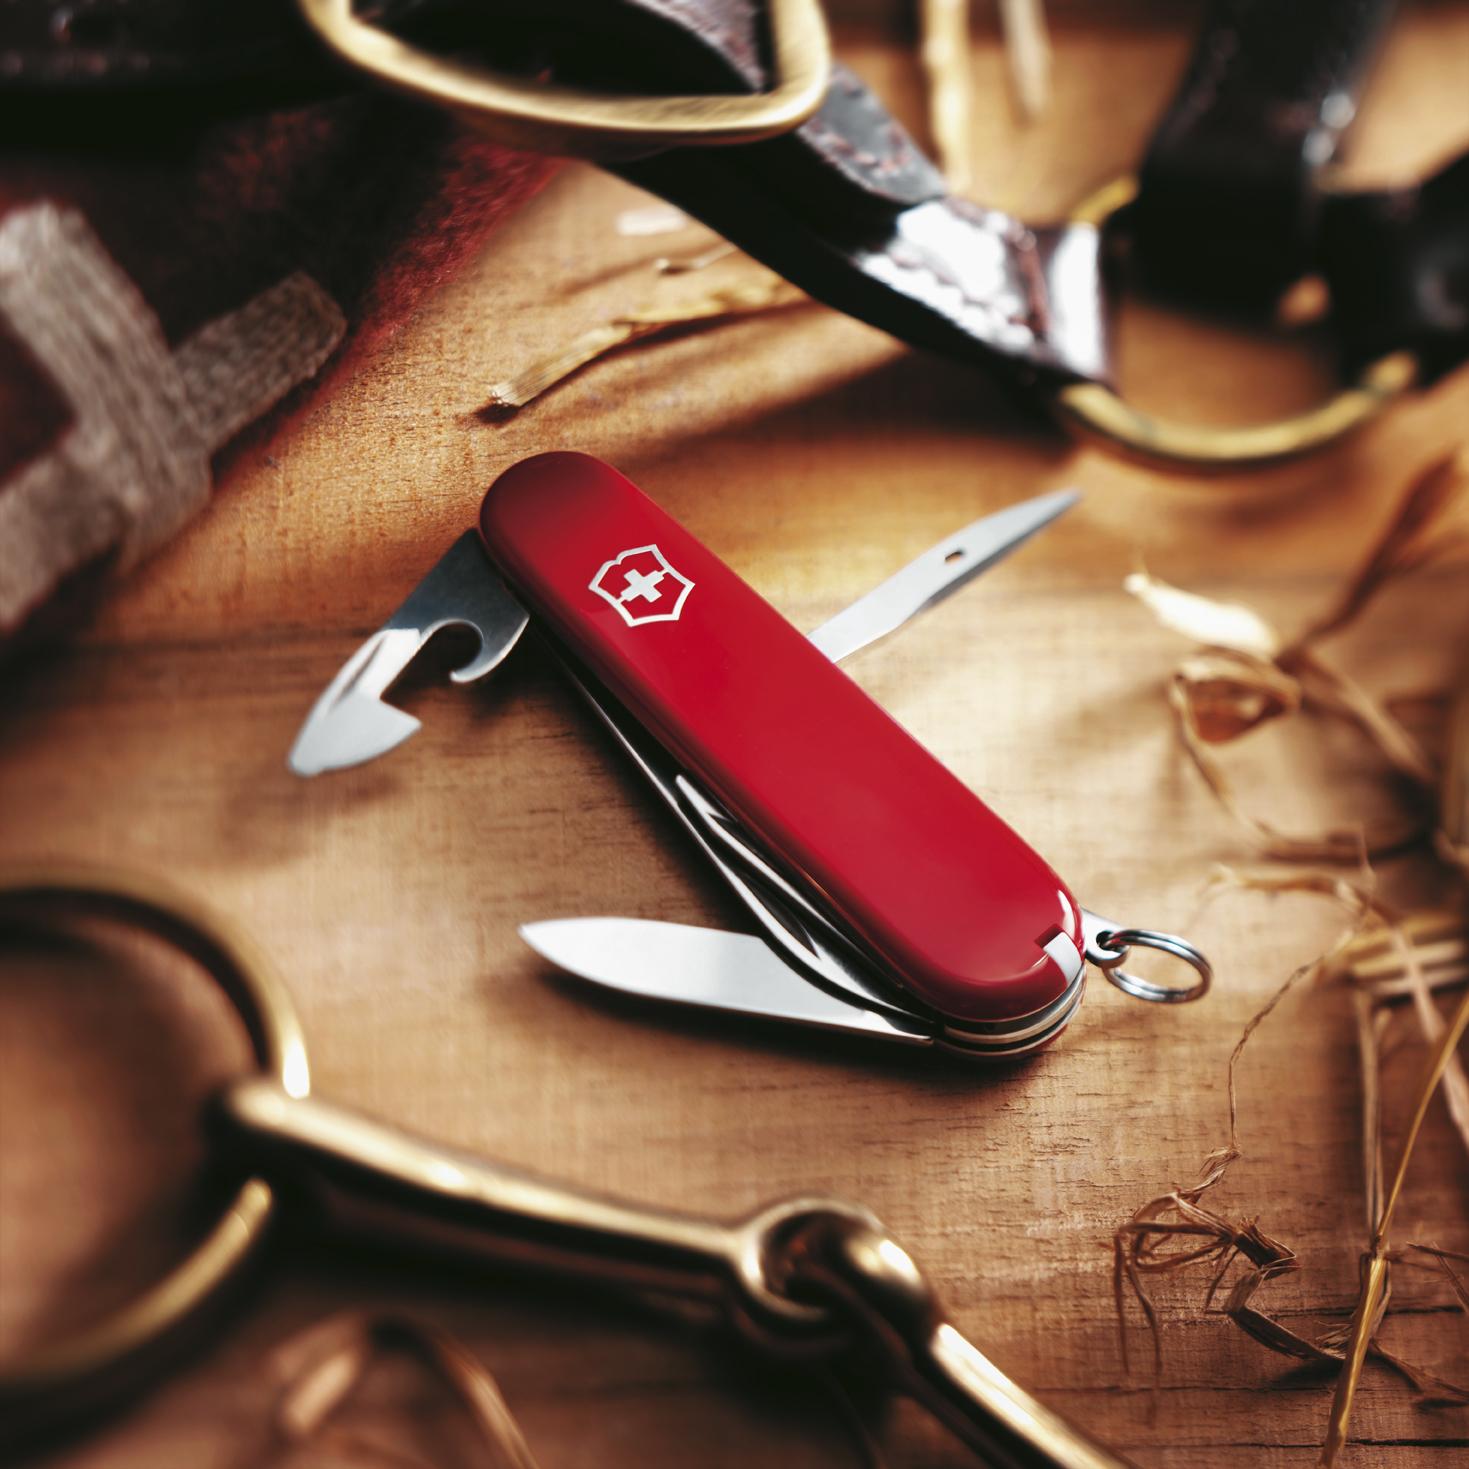 Швейцарский нож Victorinox Spartan красный (1.3603)